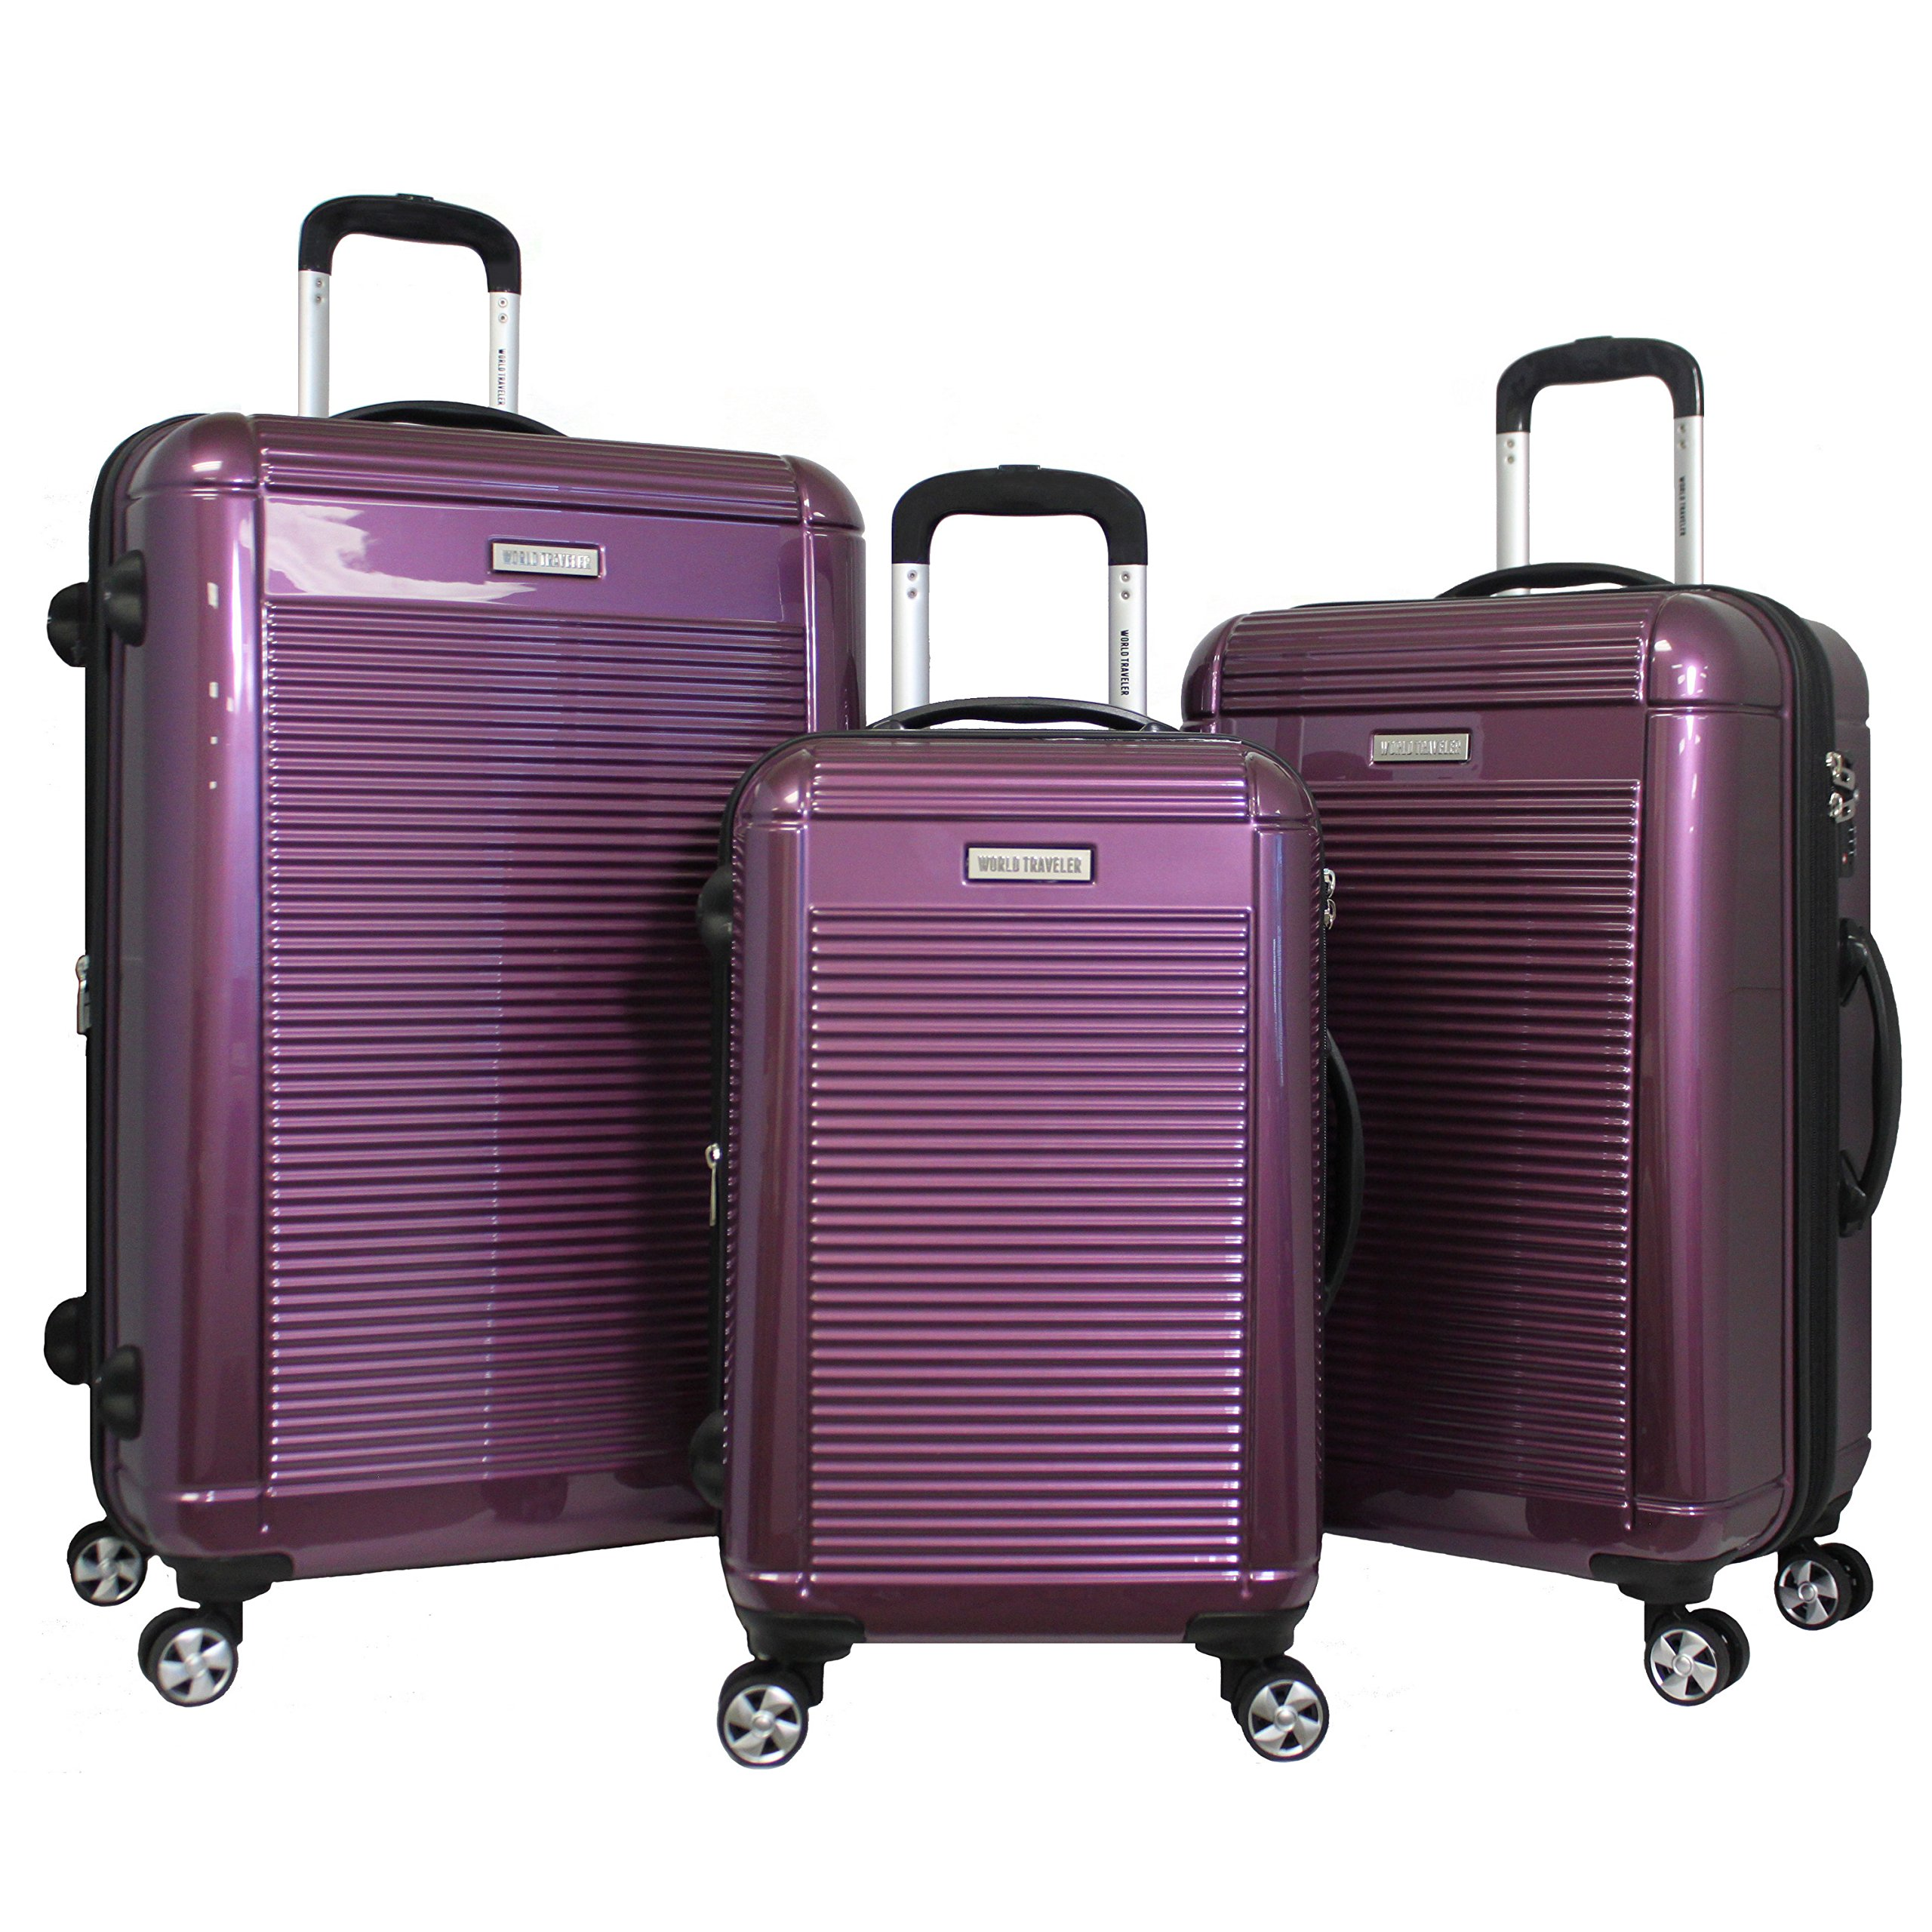 World Traveler Regal 3-Piece Hardside Lightweight Spinner Luggage Set, Purple by World Traveler